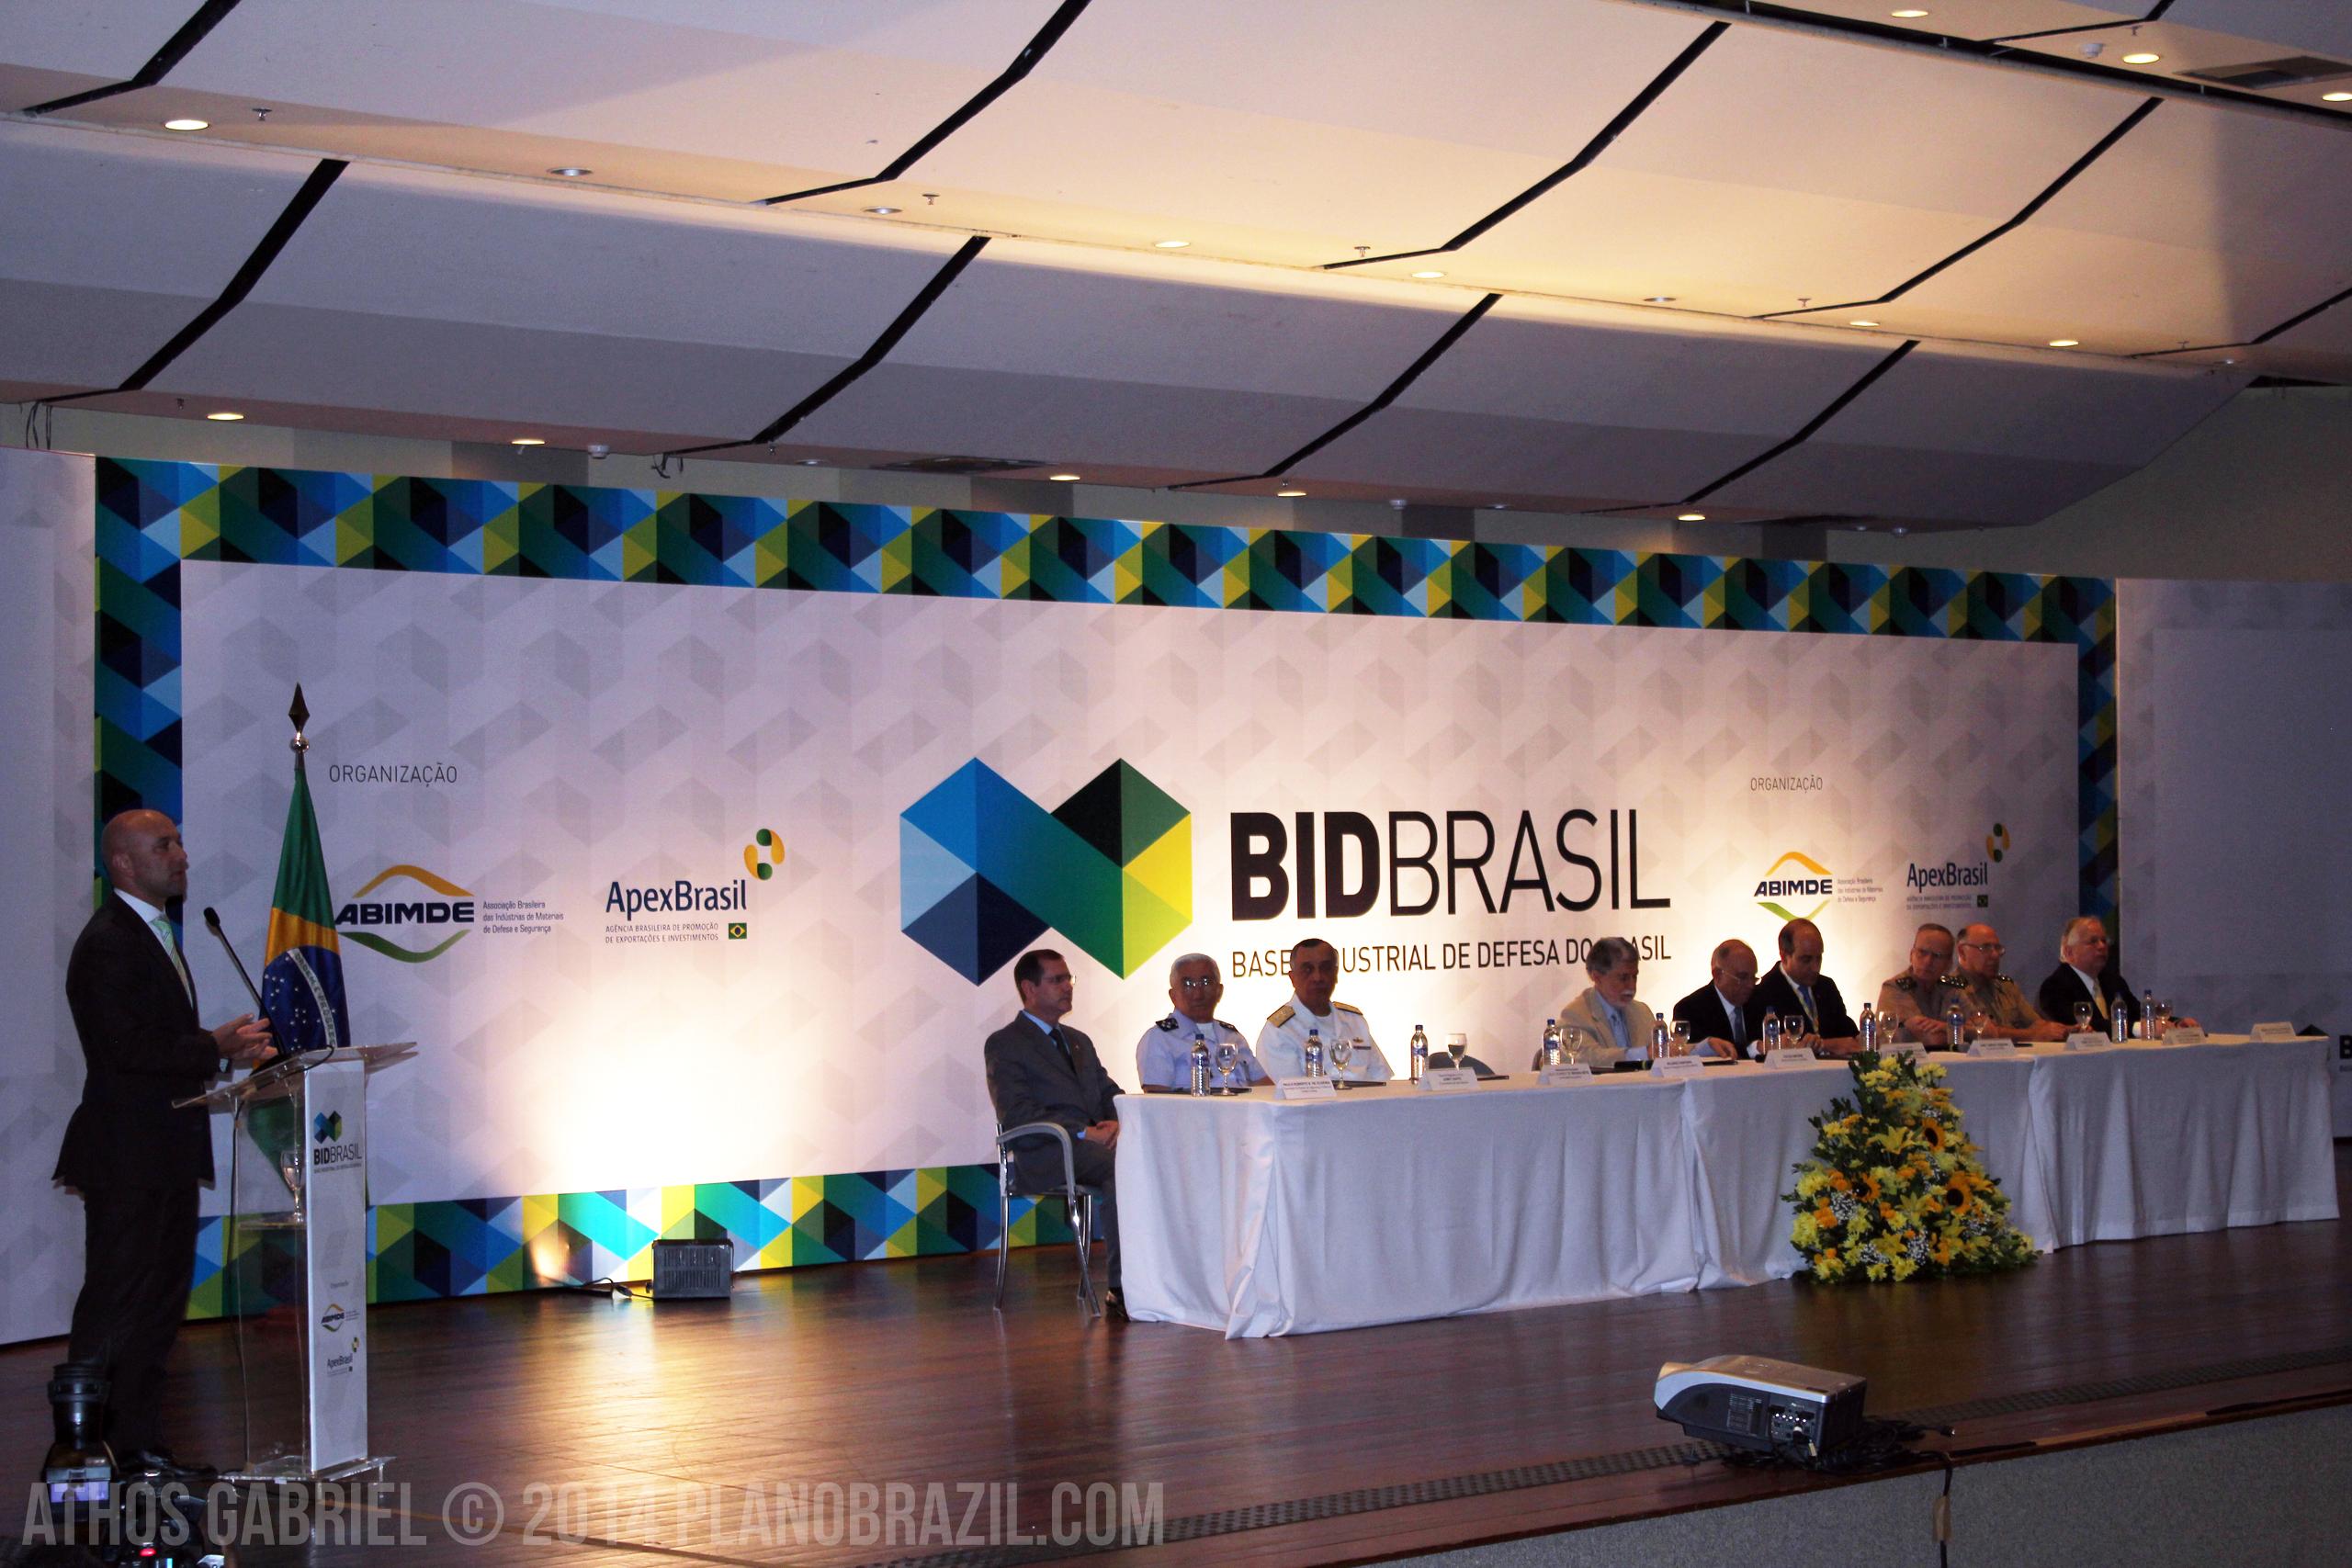 Começou hoje em Brasília a 3ª Mostra BID Brasil